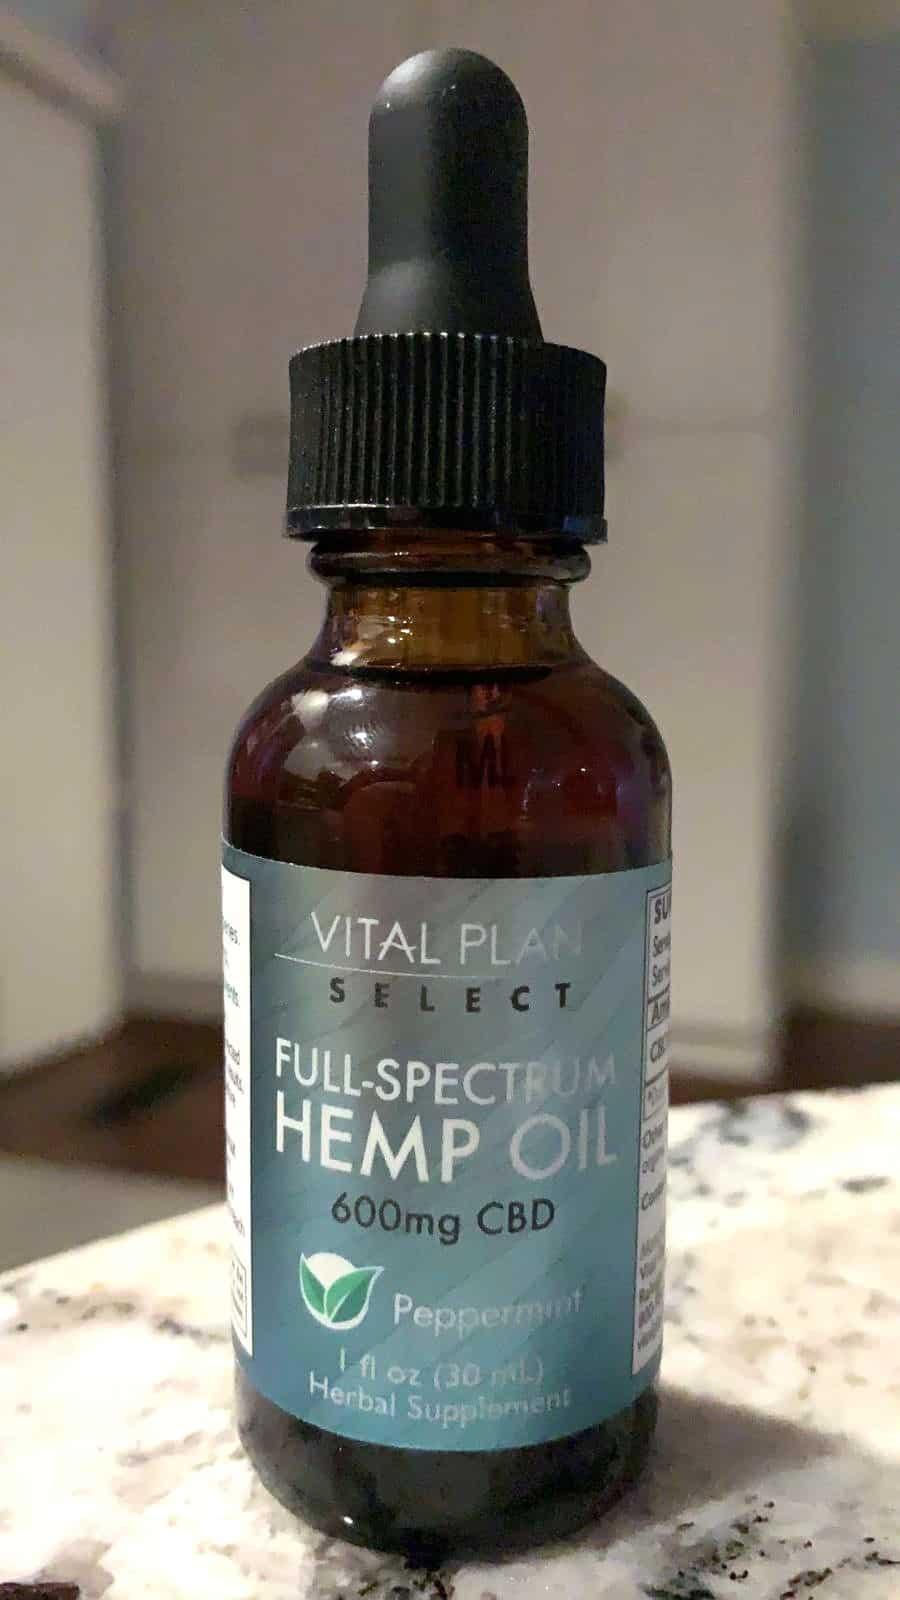 Vital Plan Select Full Spectrum Hemp Oil Tincture 600mg Peppermint testing process